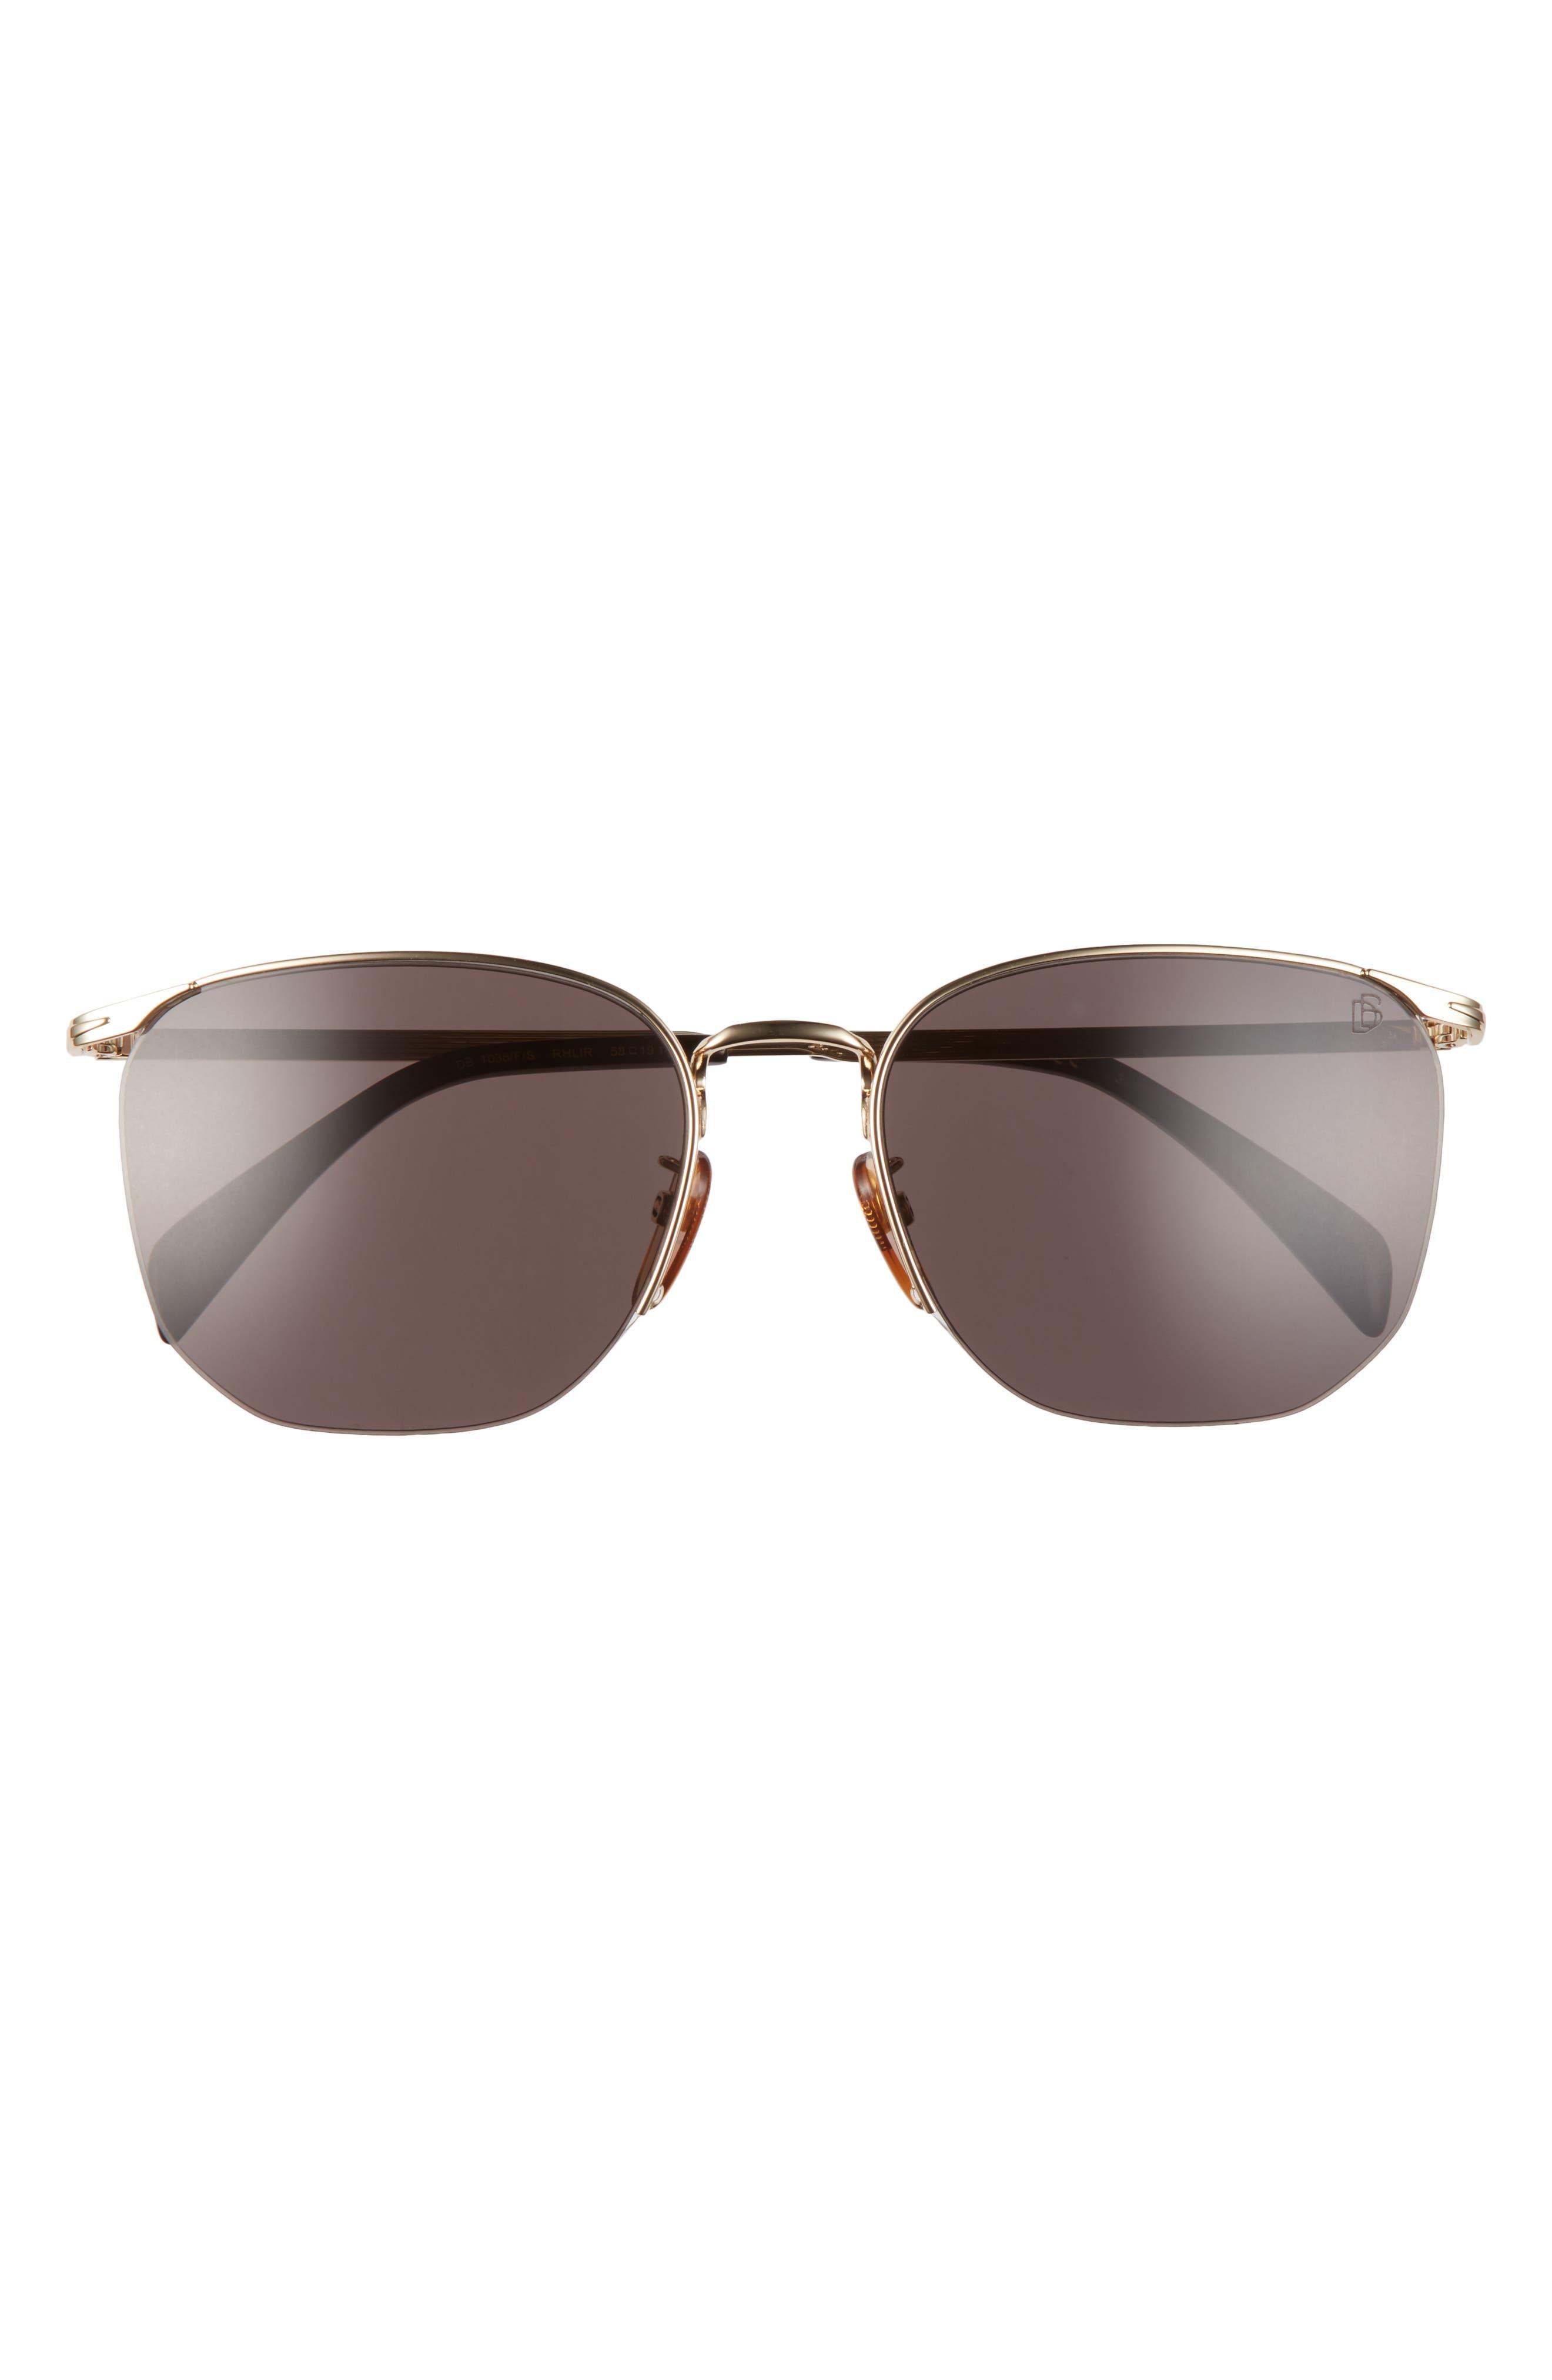 Men's Eyewear By David Beckham 58mm Rectangular Sunglasses